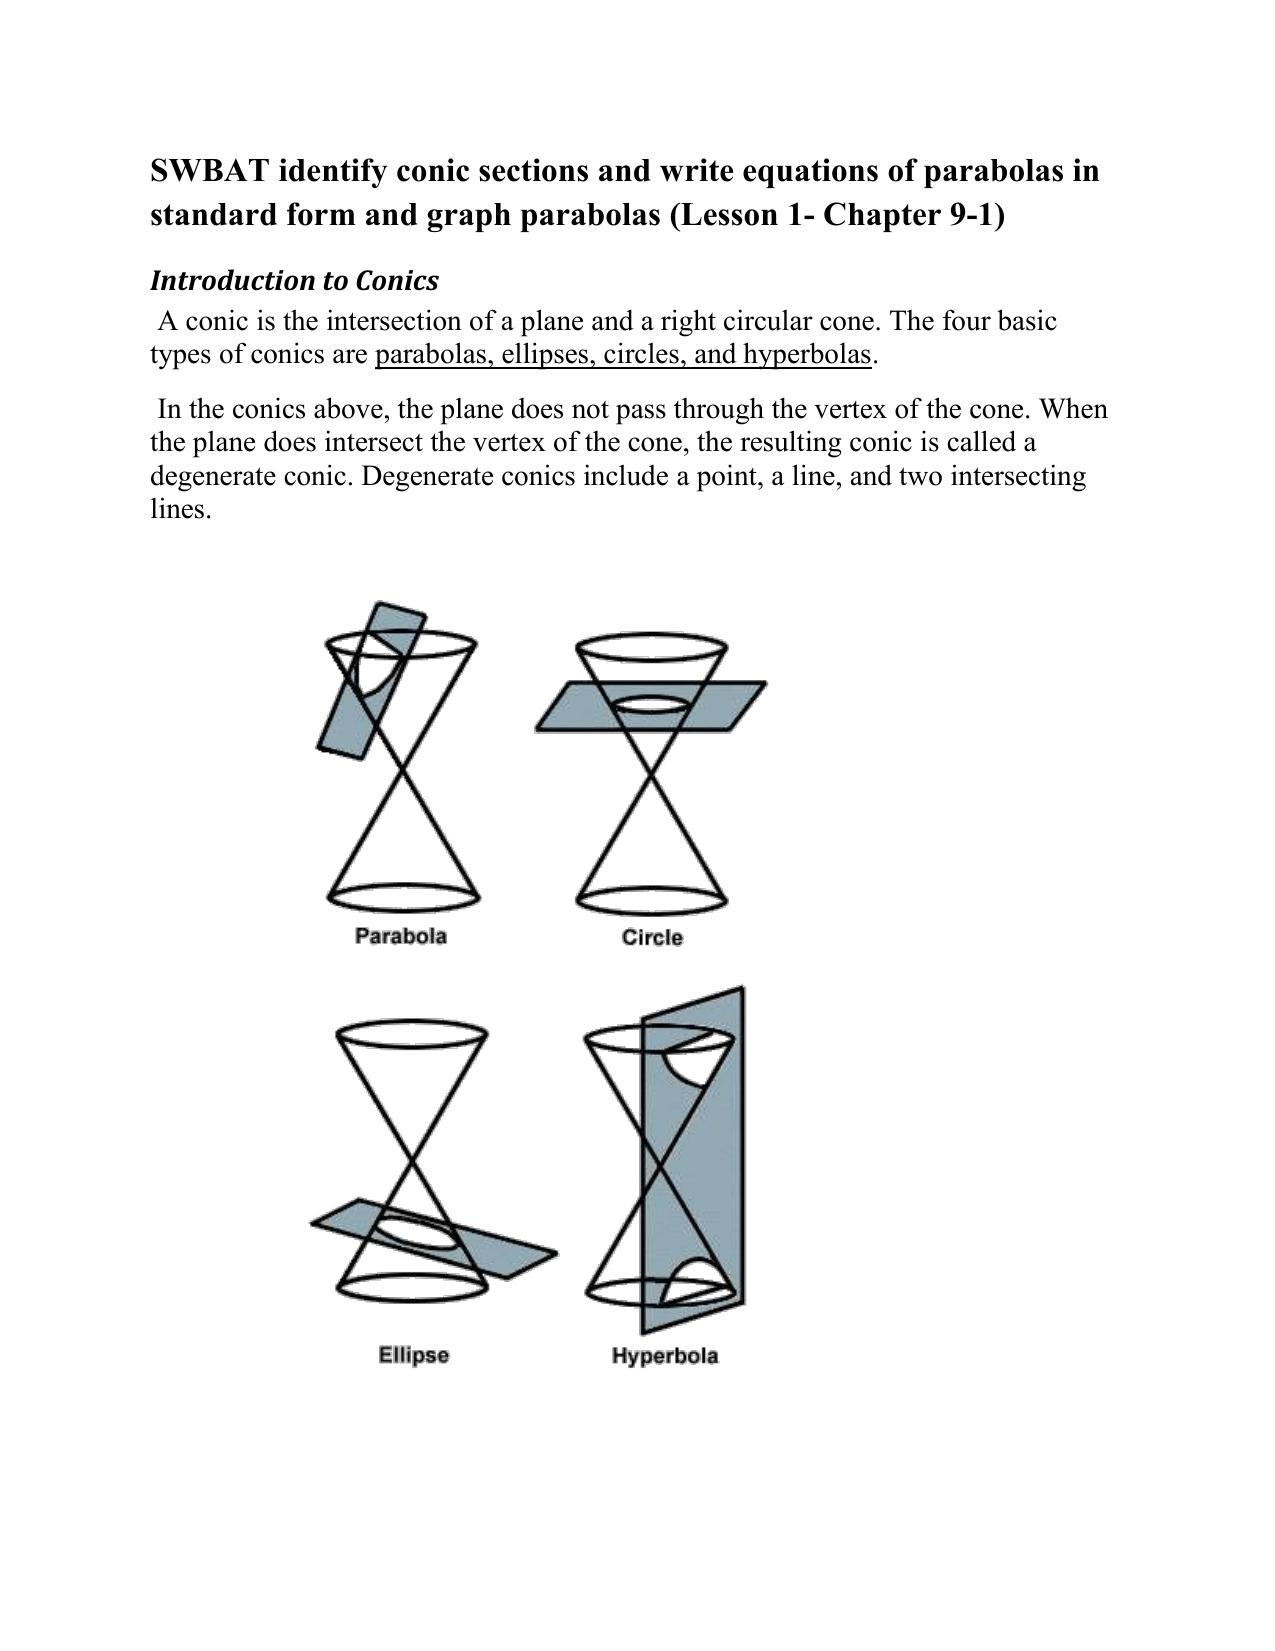 Equation Of A Line Circle Ellipse Parabola Hyperbola